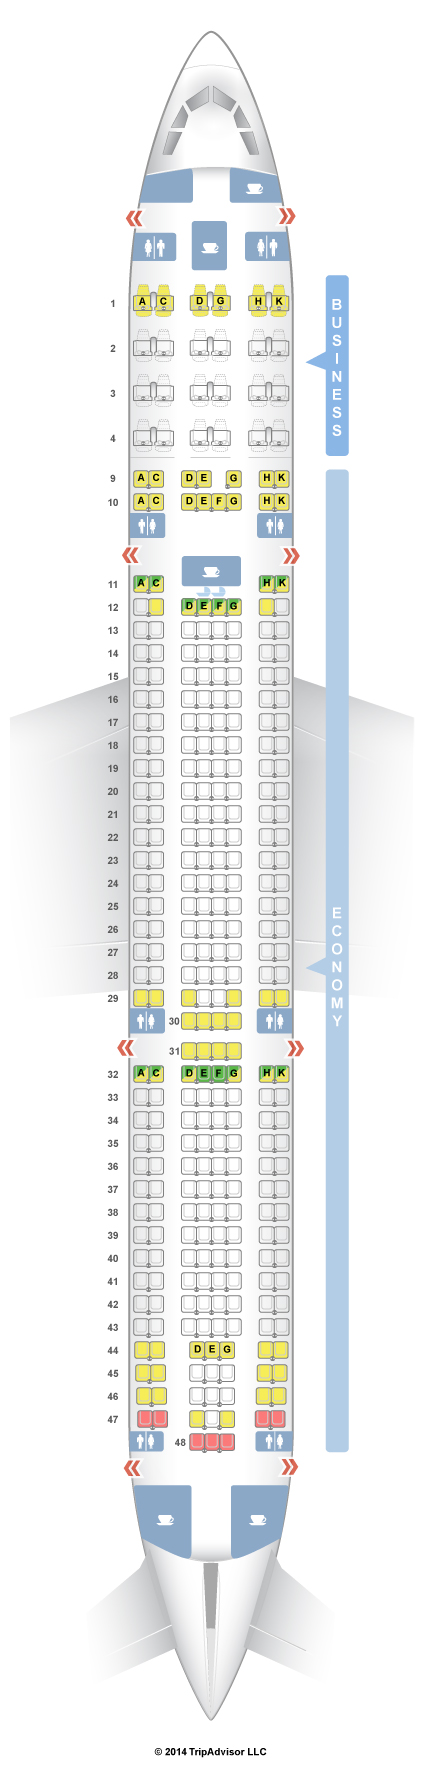 Seatguru Seat Map Aer Lingus Airbus A330 300 330 Ireland